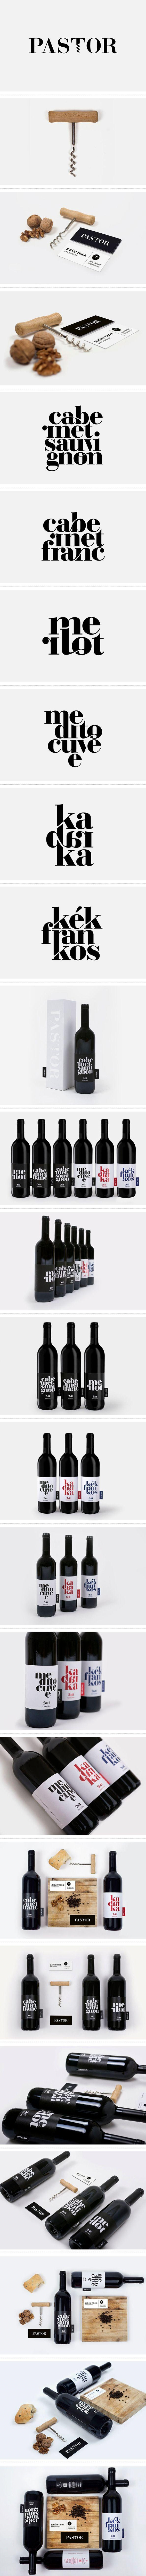 Pastor winery identity and branding